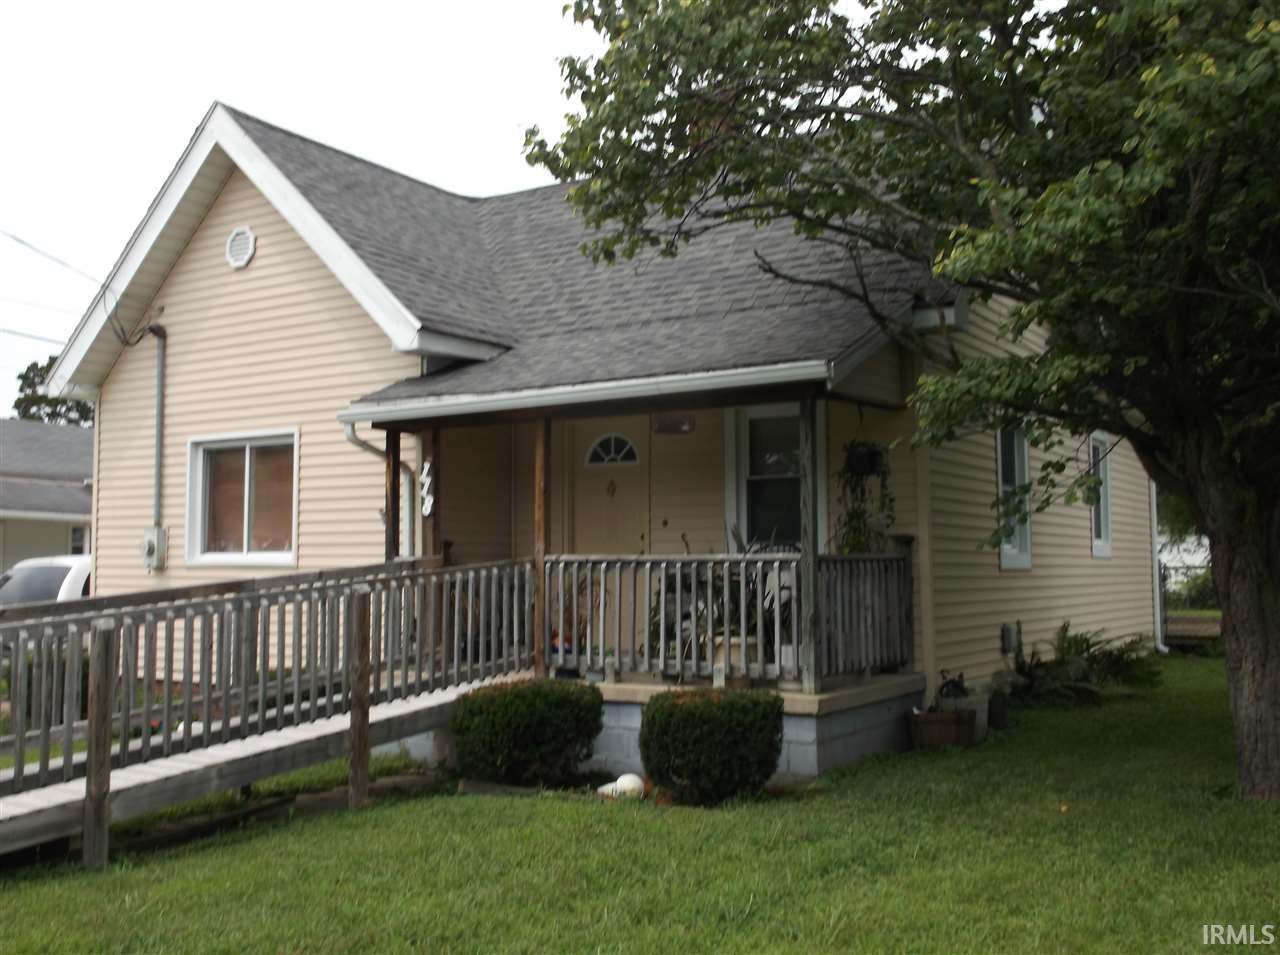 118 W South St., Bloomfield, IN 47424